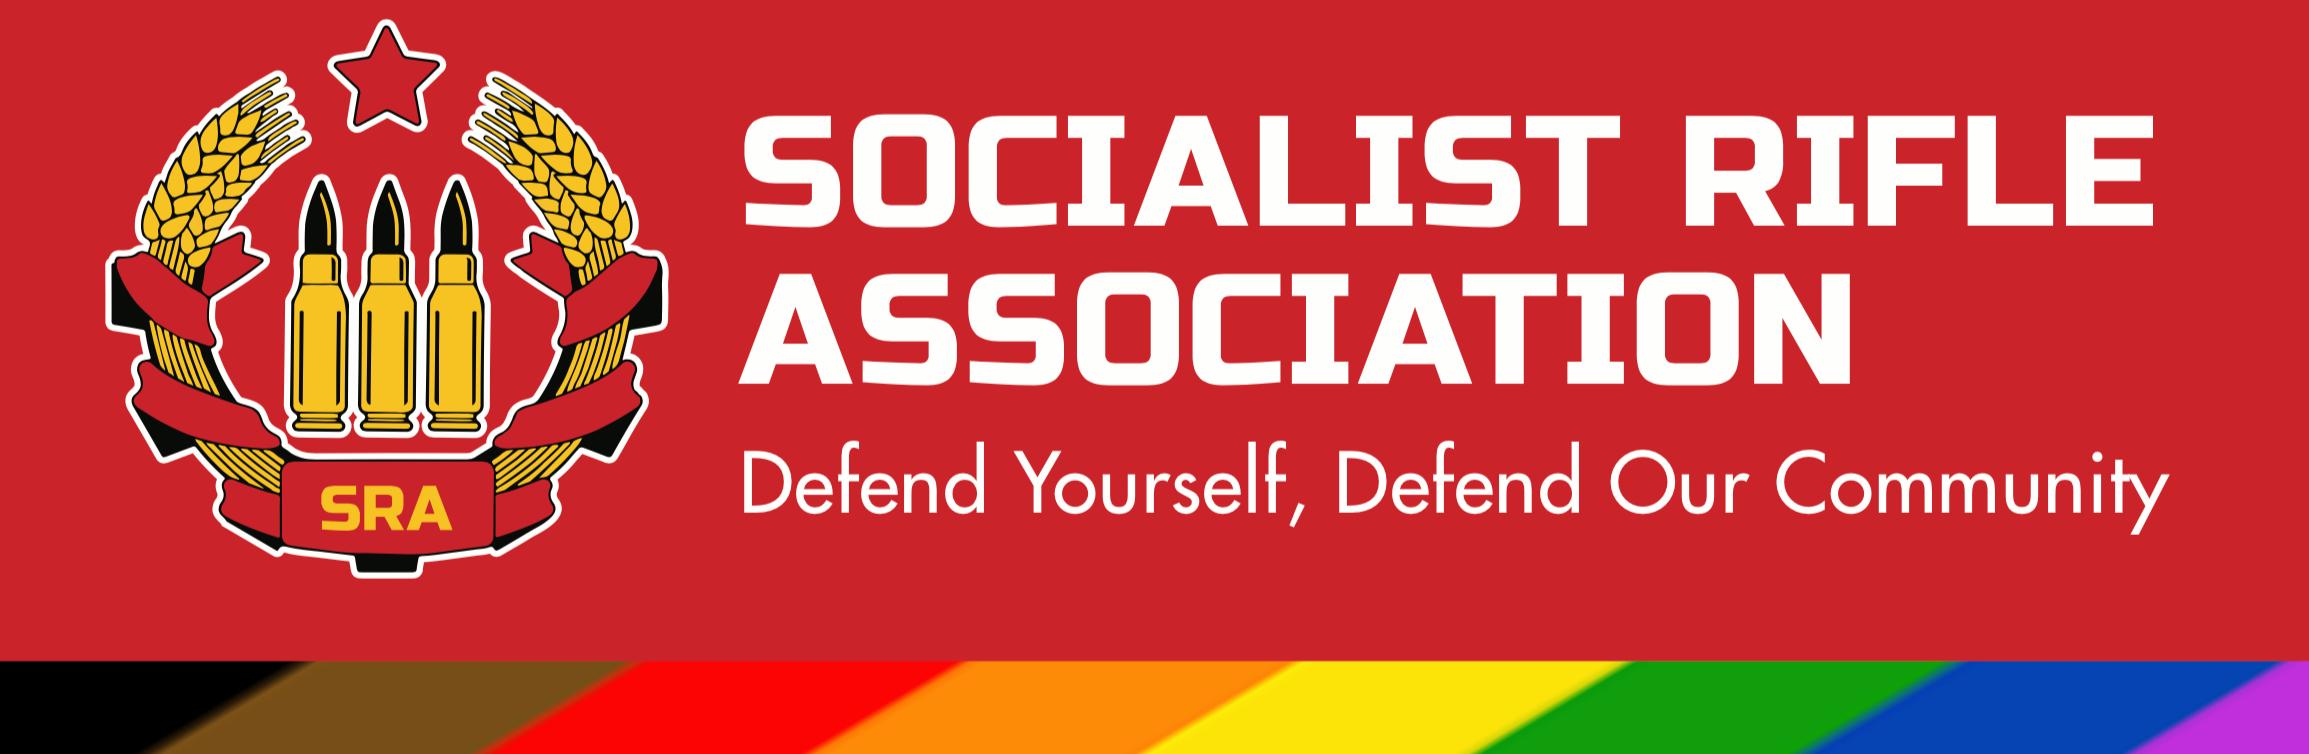 https://www.joinit.org/o/socialist-rifle-association/